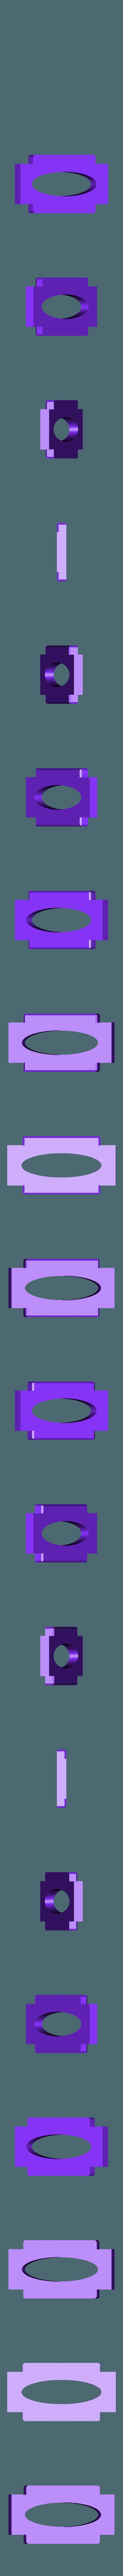 HDS 3-L.STL Download STL file NEW - Hard Drive SKYSCRAPER • 3D printer template, salva65